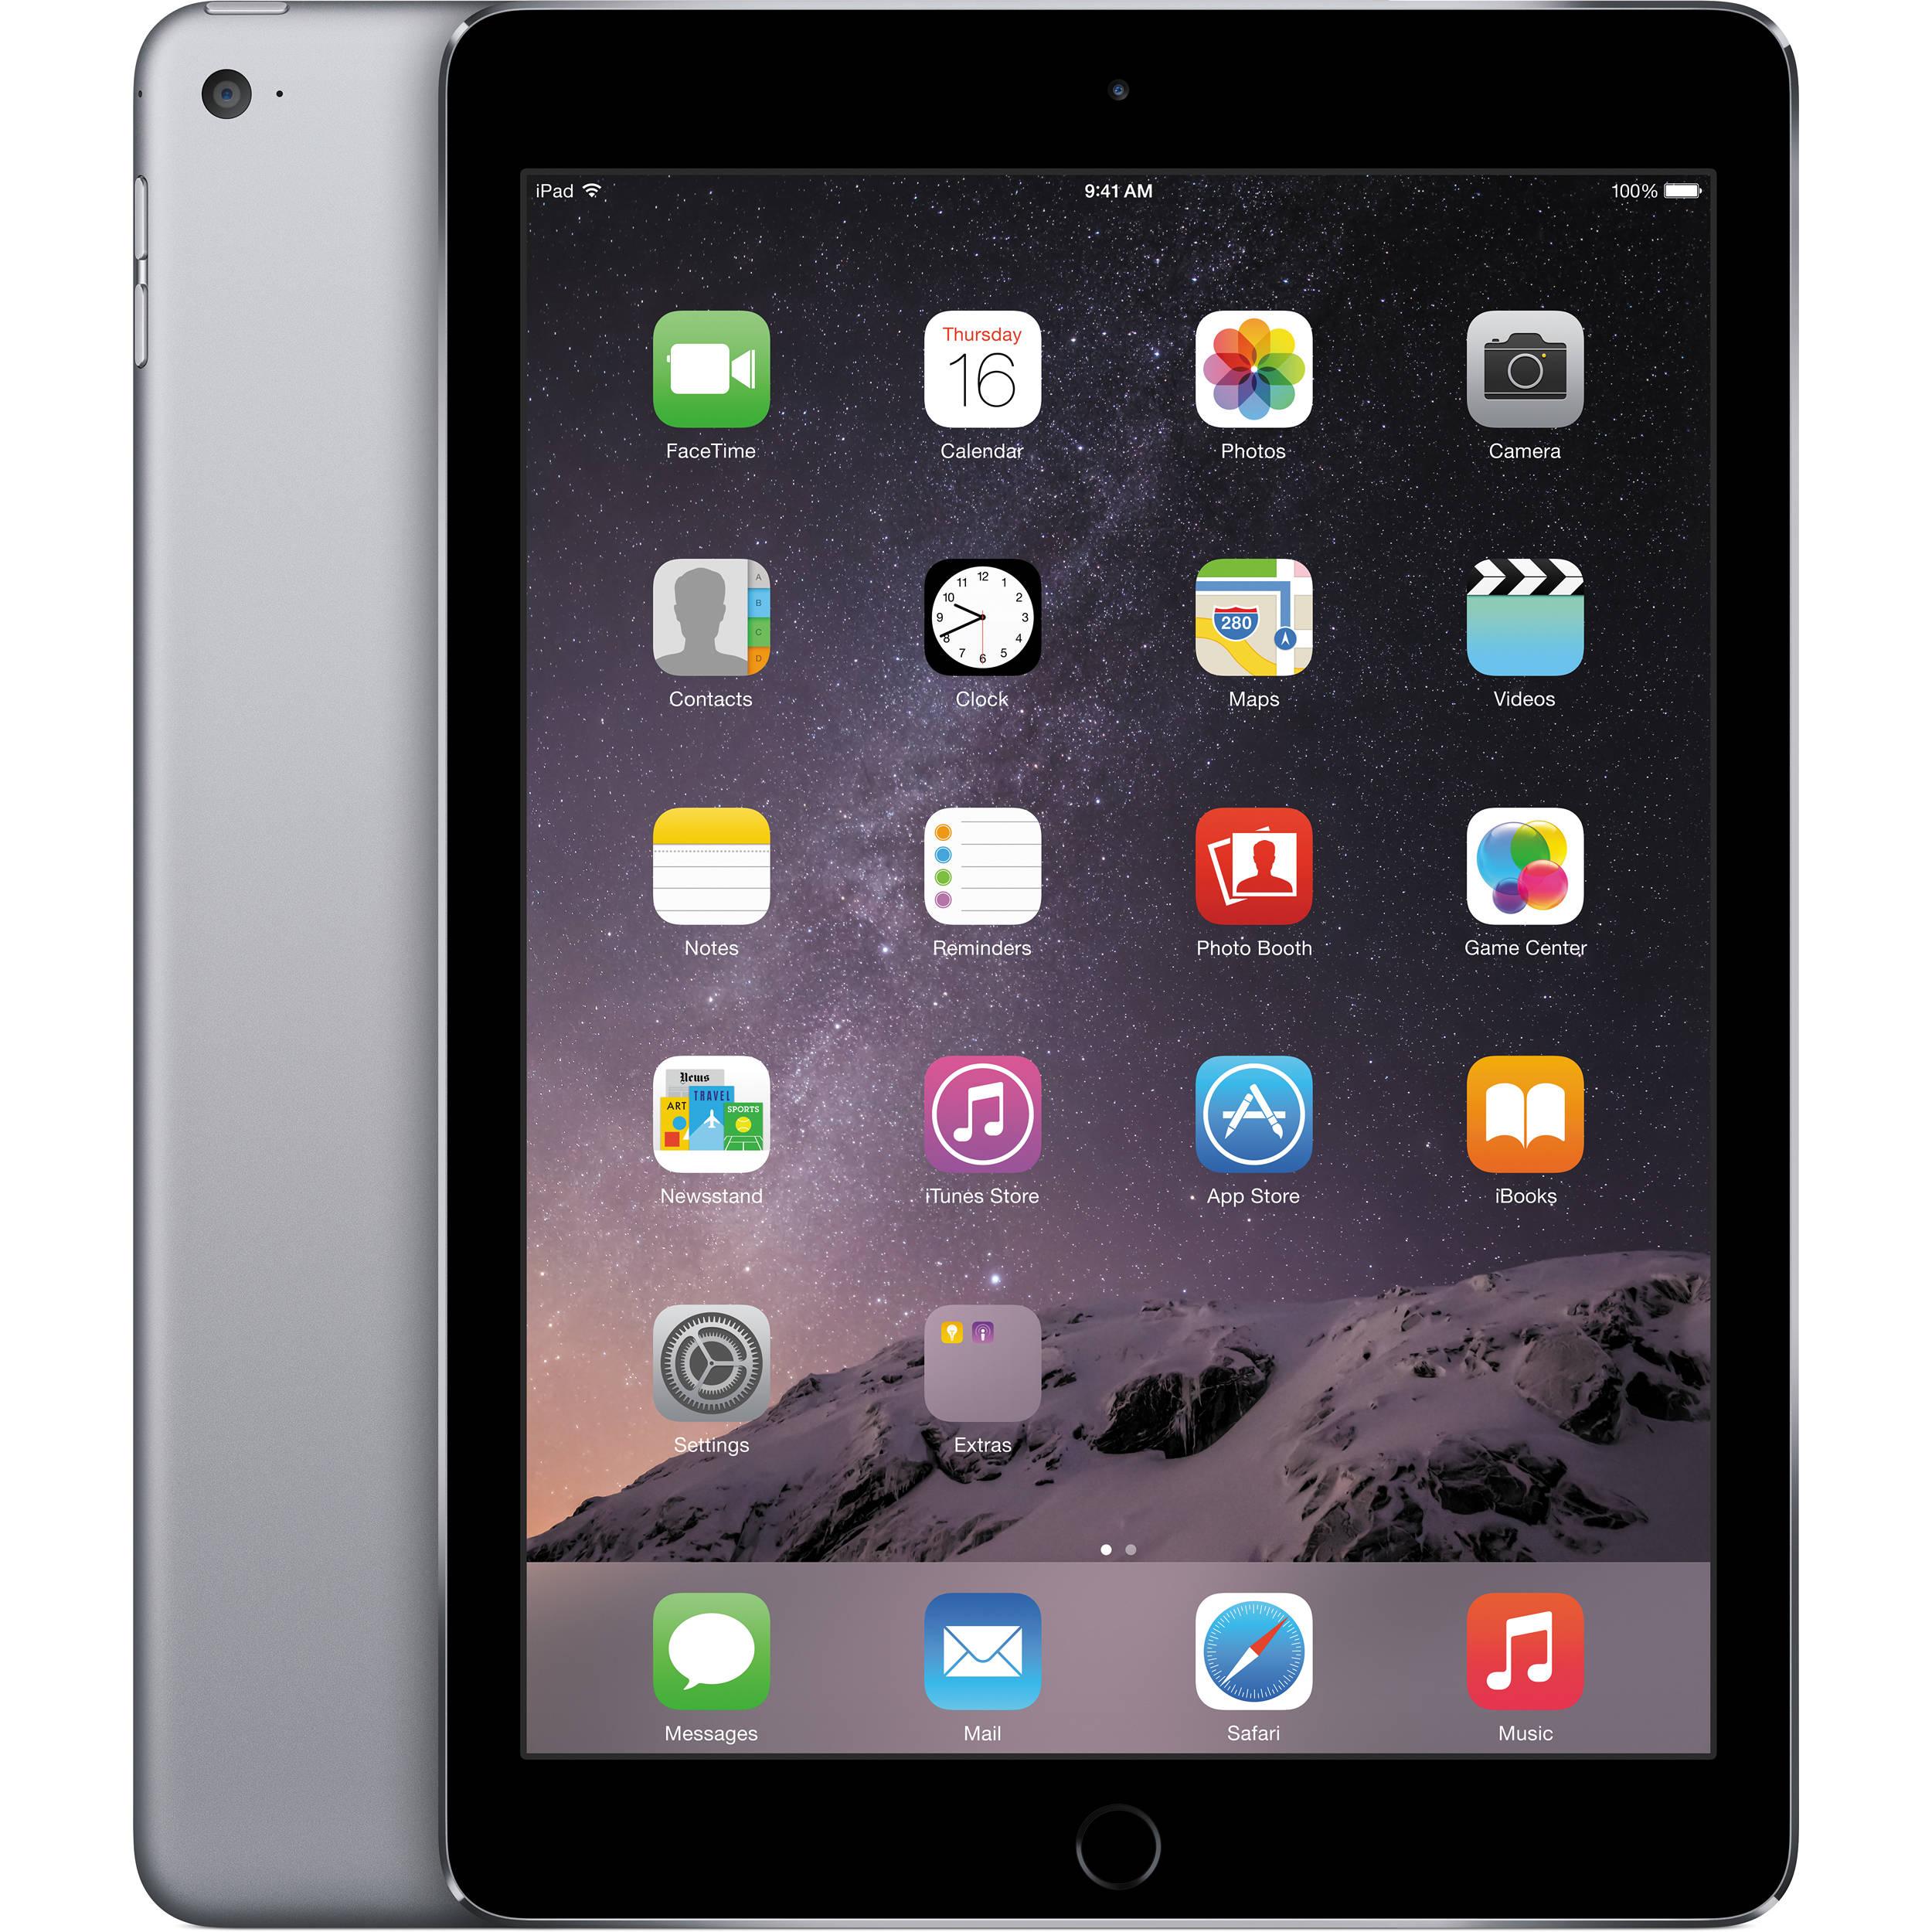 Apple Ipad Air 2 Background Apple 64gb Ipad Air 2 Wi-fi